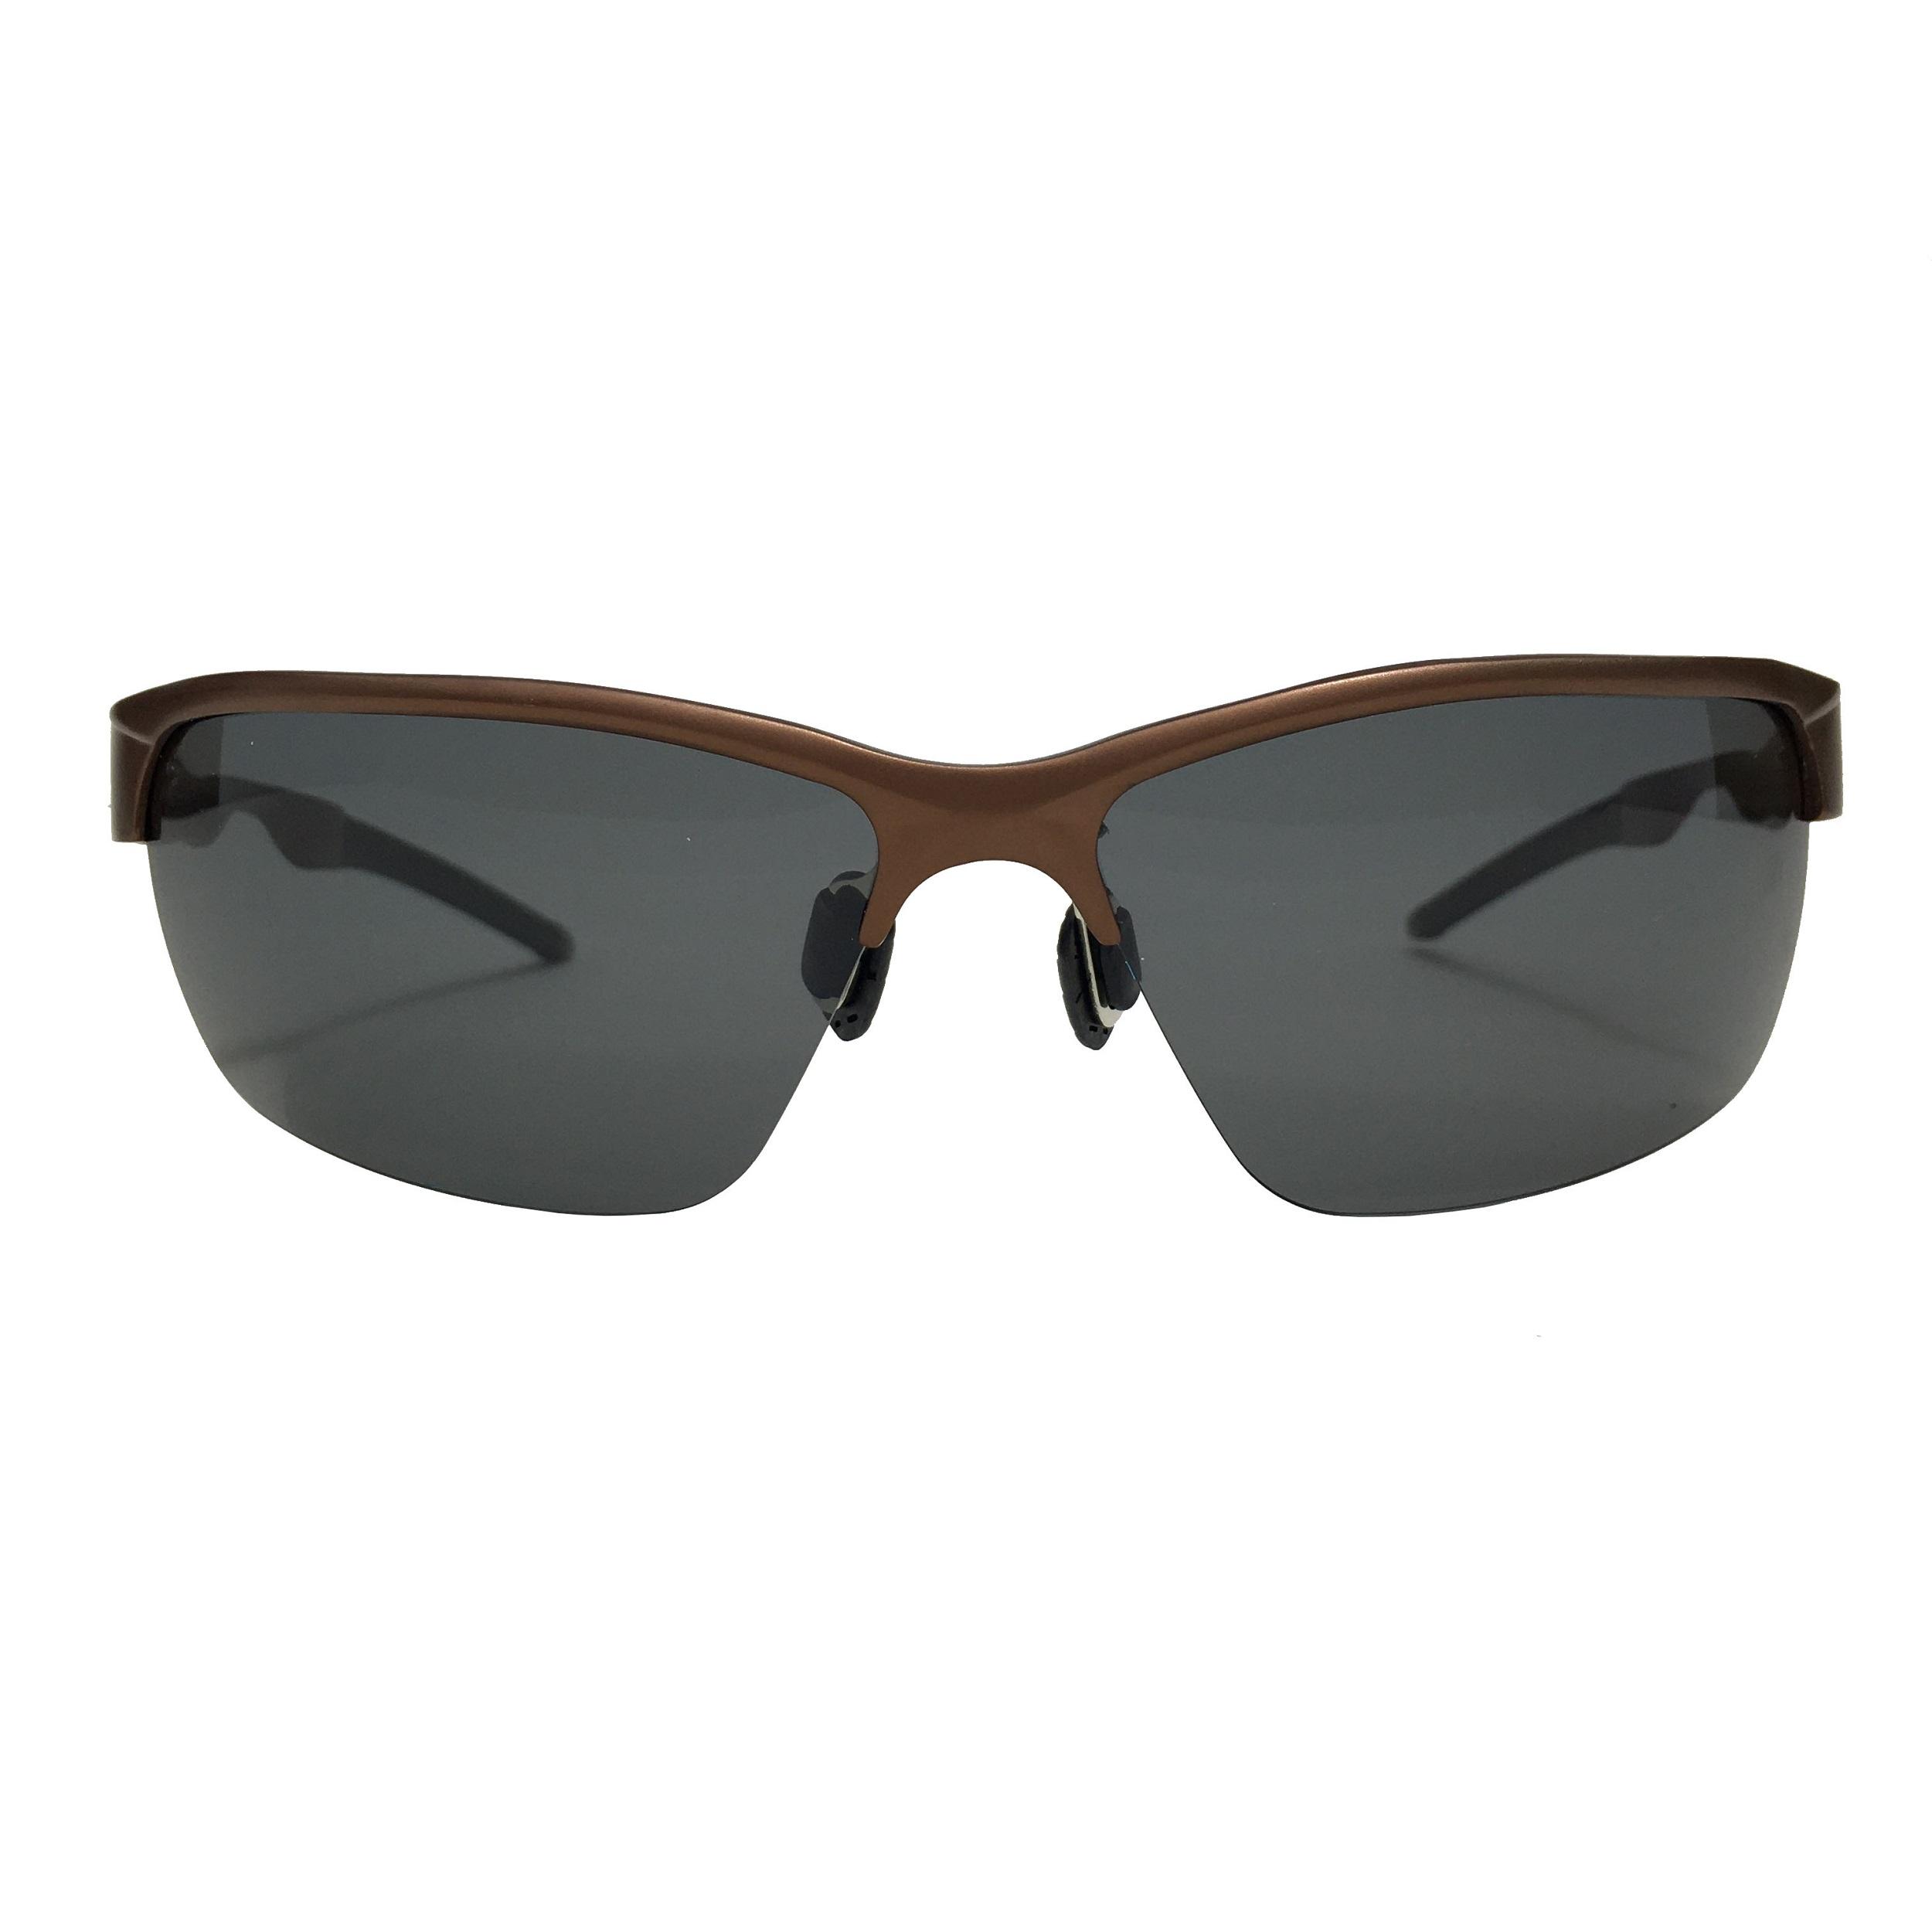 عینک آفتابی  مدل 3018                     غیر اصل